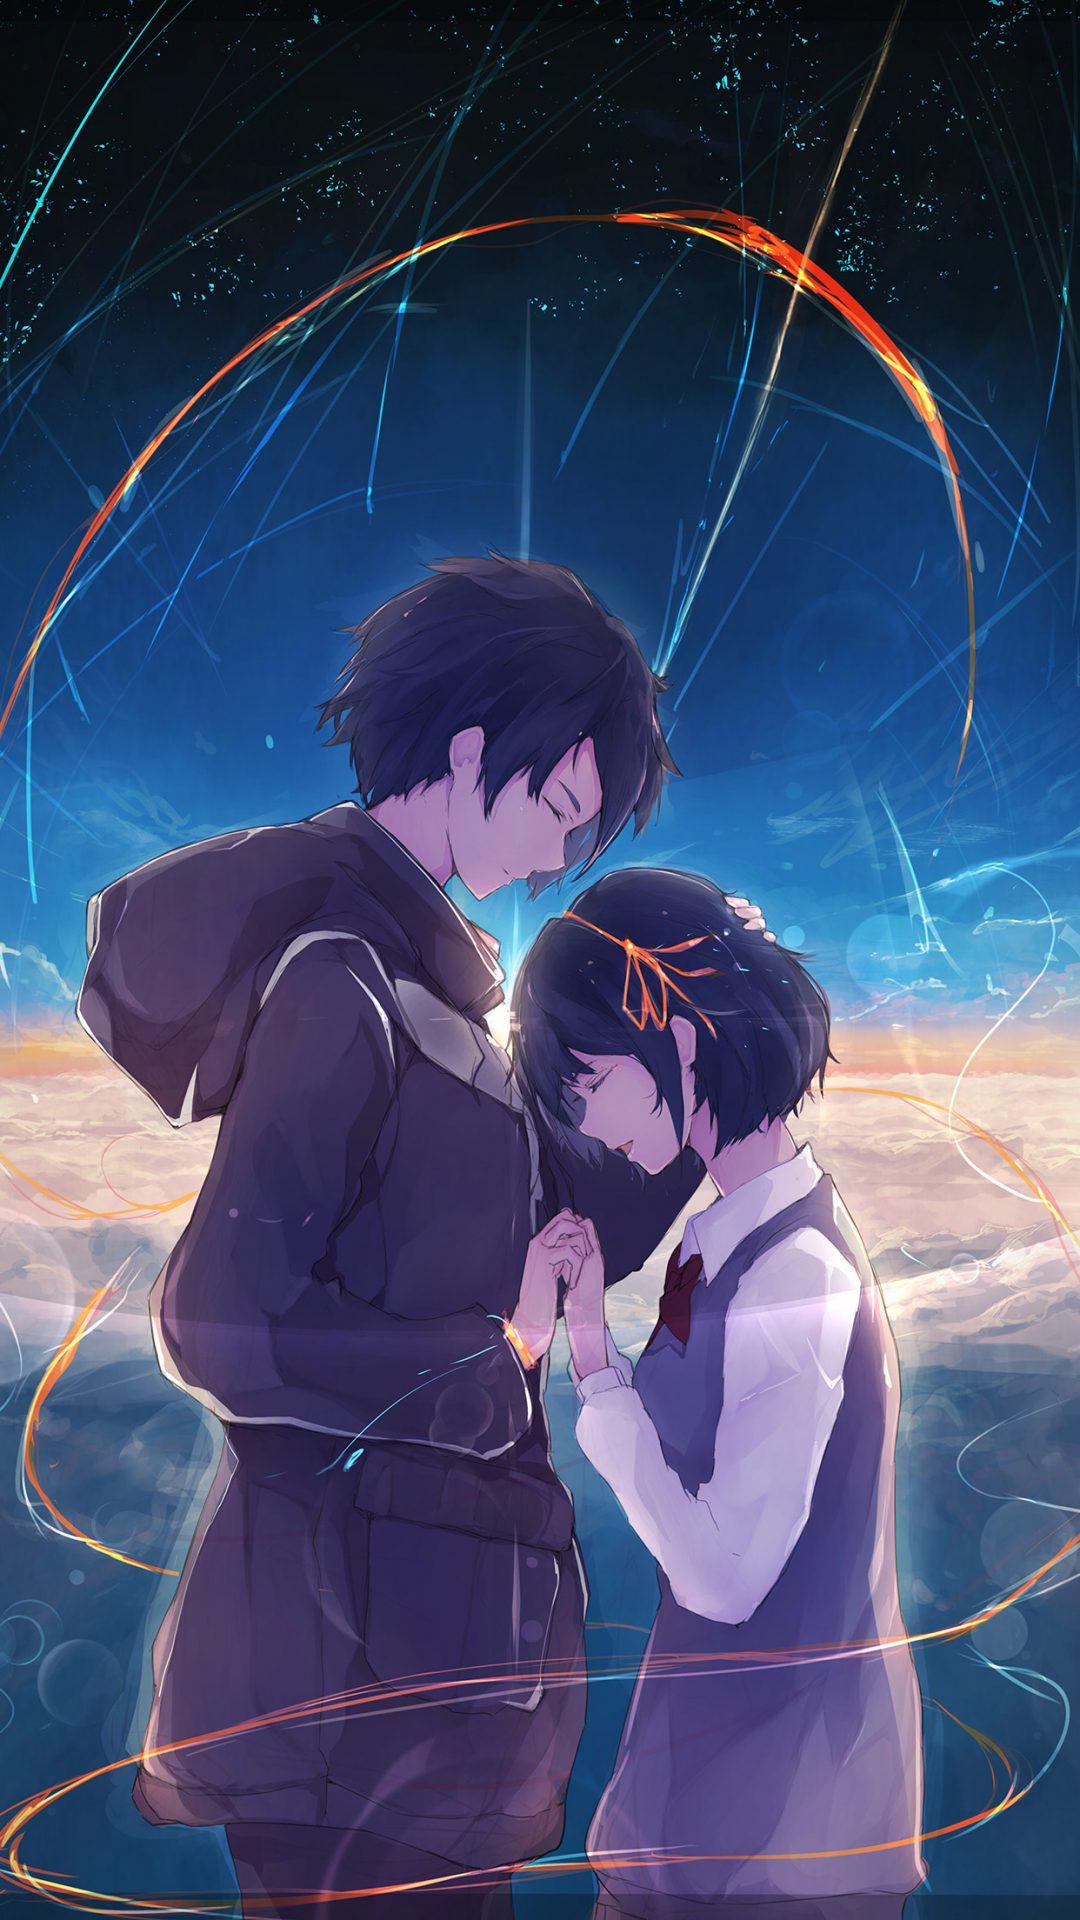 Anime Kiminonawa Drawing Art Illustration